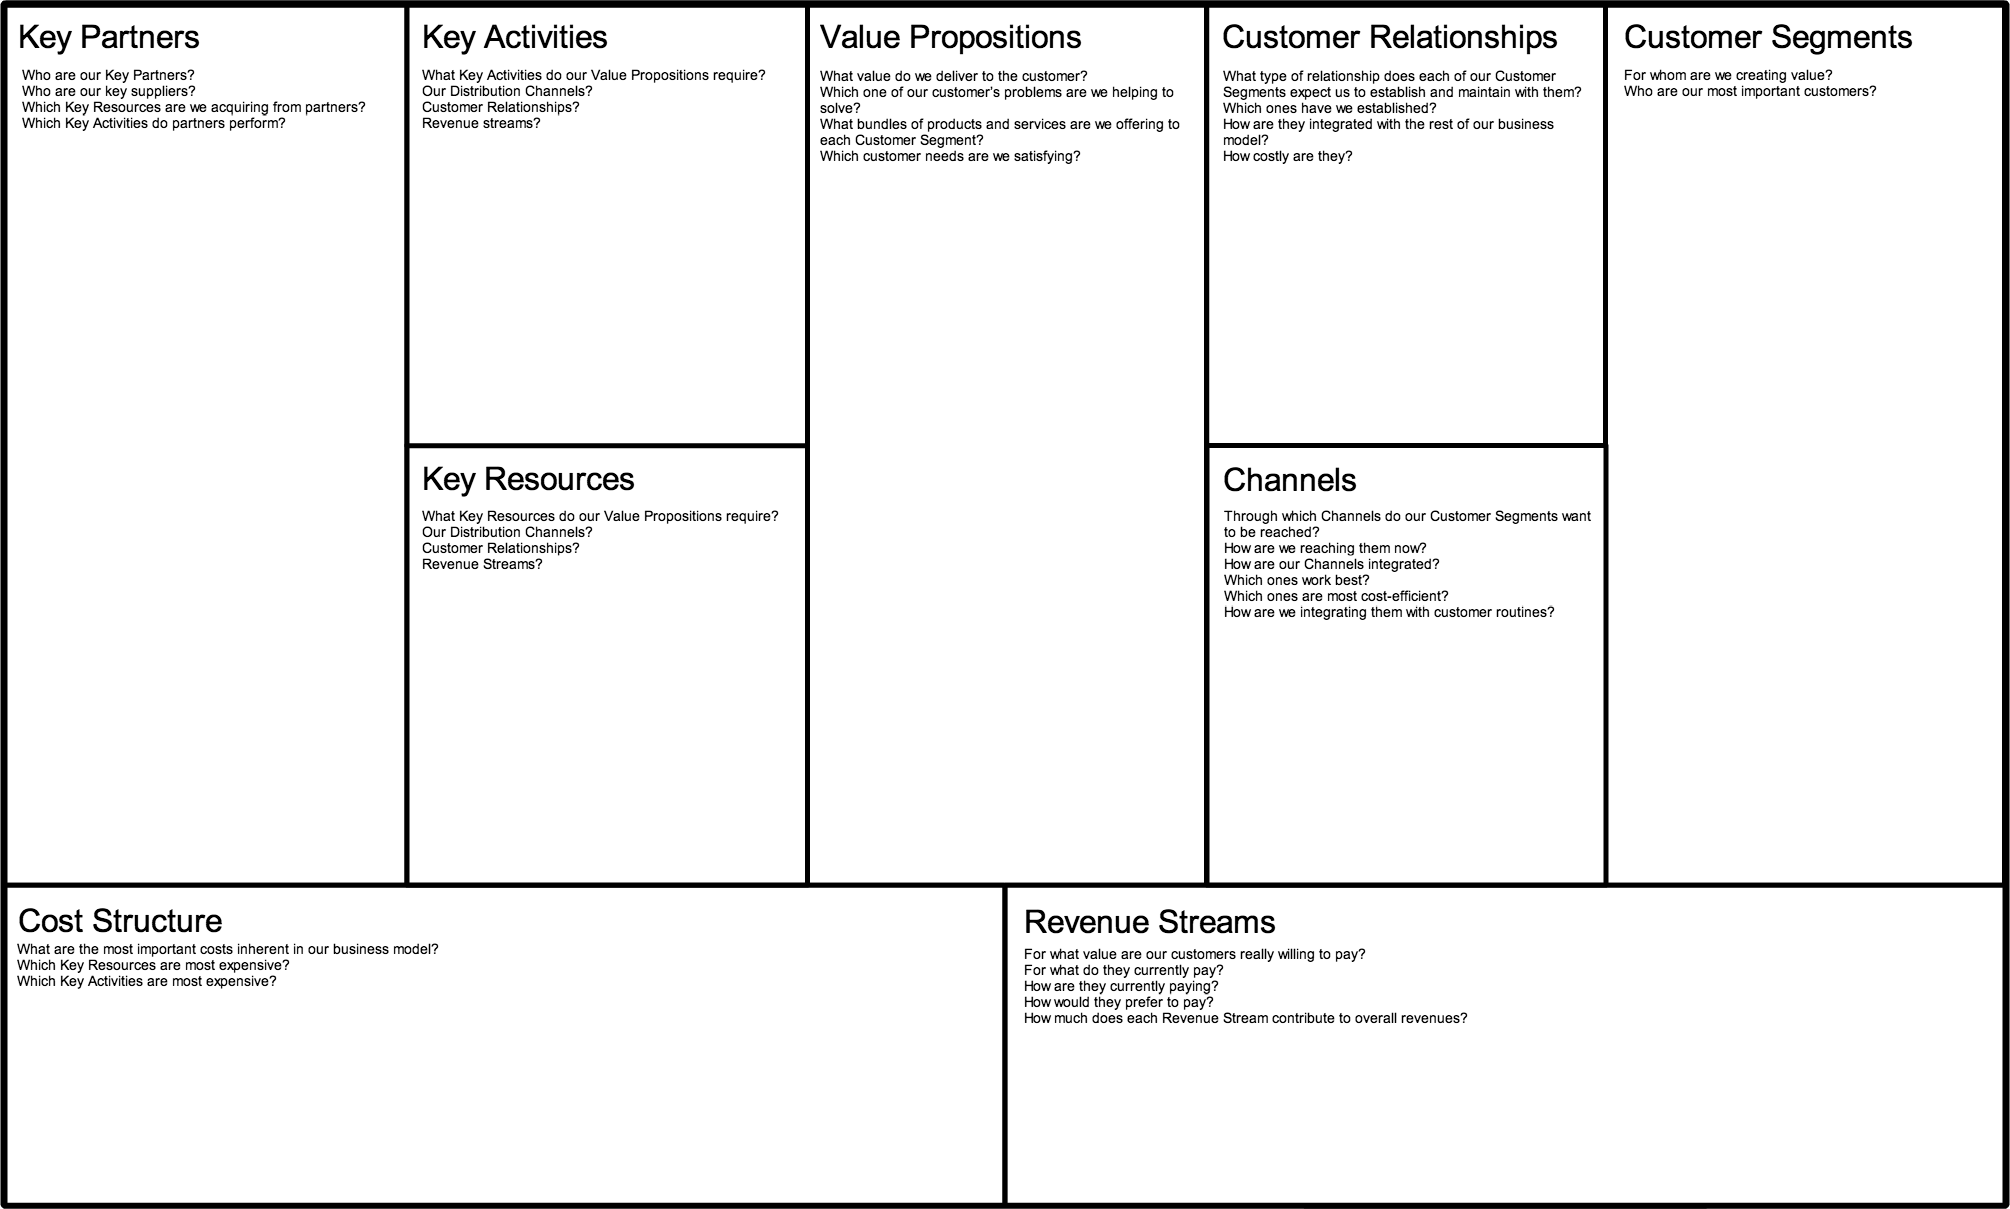 Business Model Canvas The 9 Building Blocks Explained